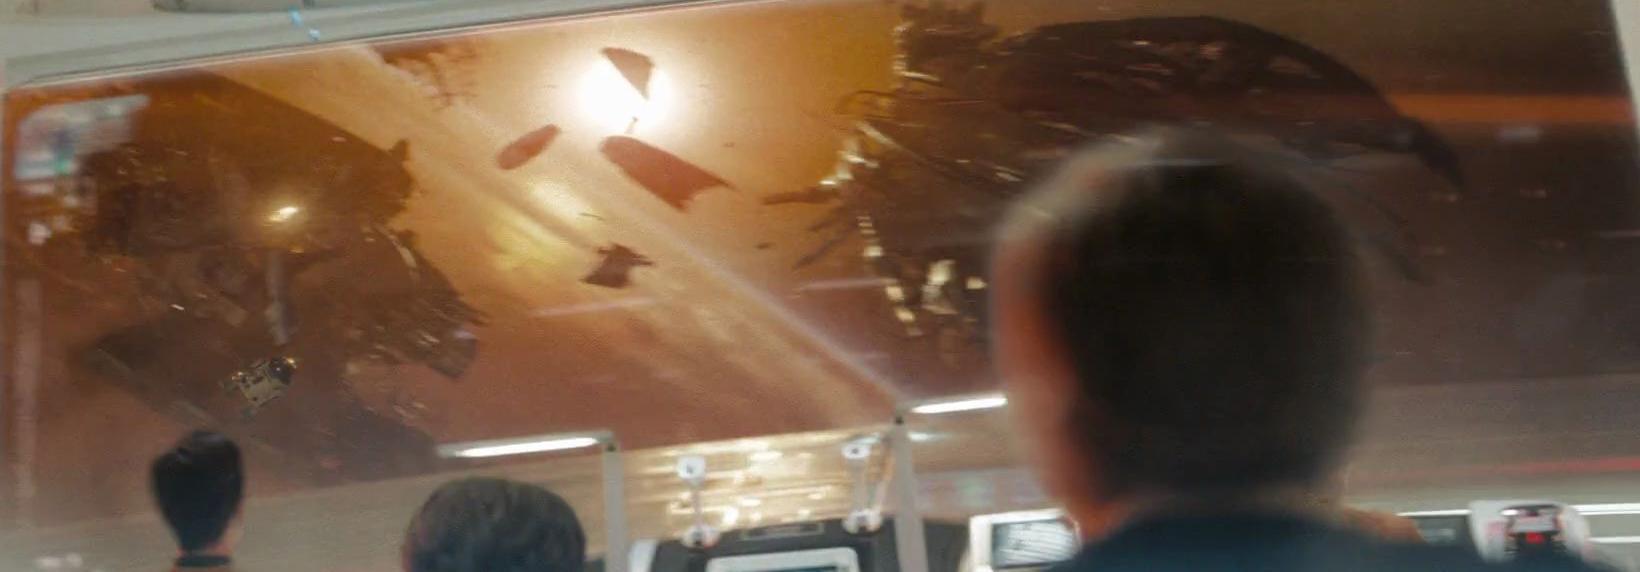 OT - The Dark Side of Star Trek: Do You See It Too?  9116571824_c5b8160909_o